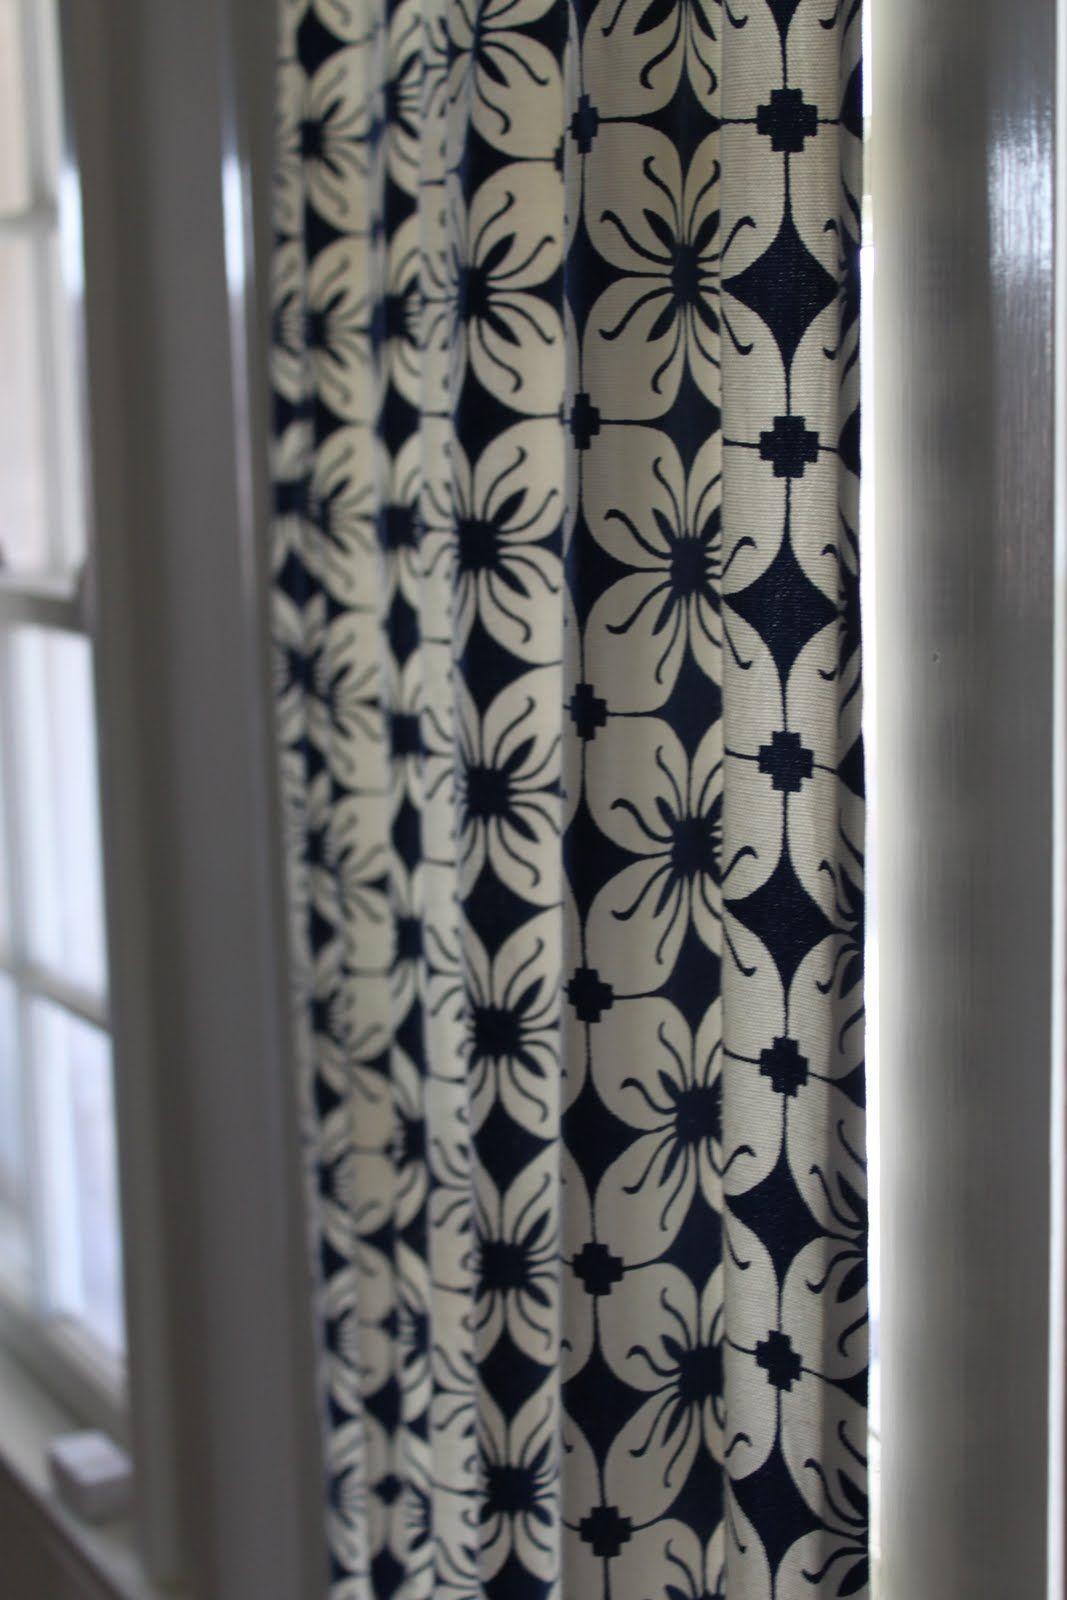 DIY French Door Curtain Panel Tutorial weekend project ...